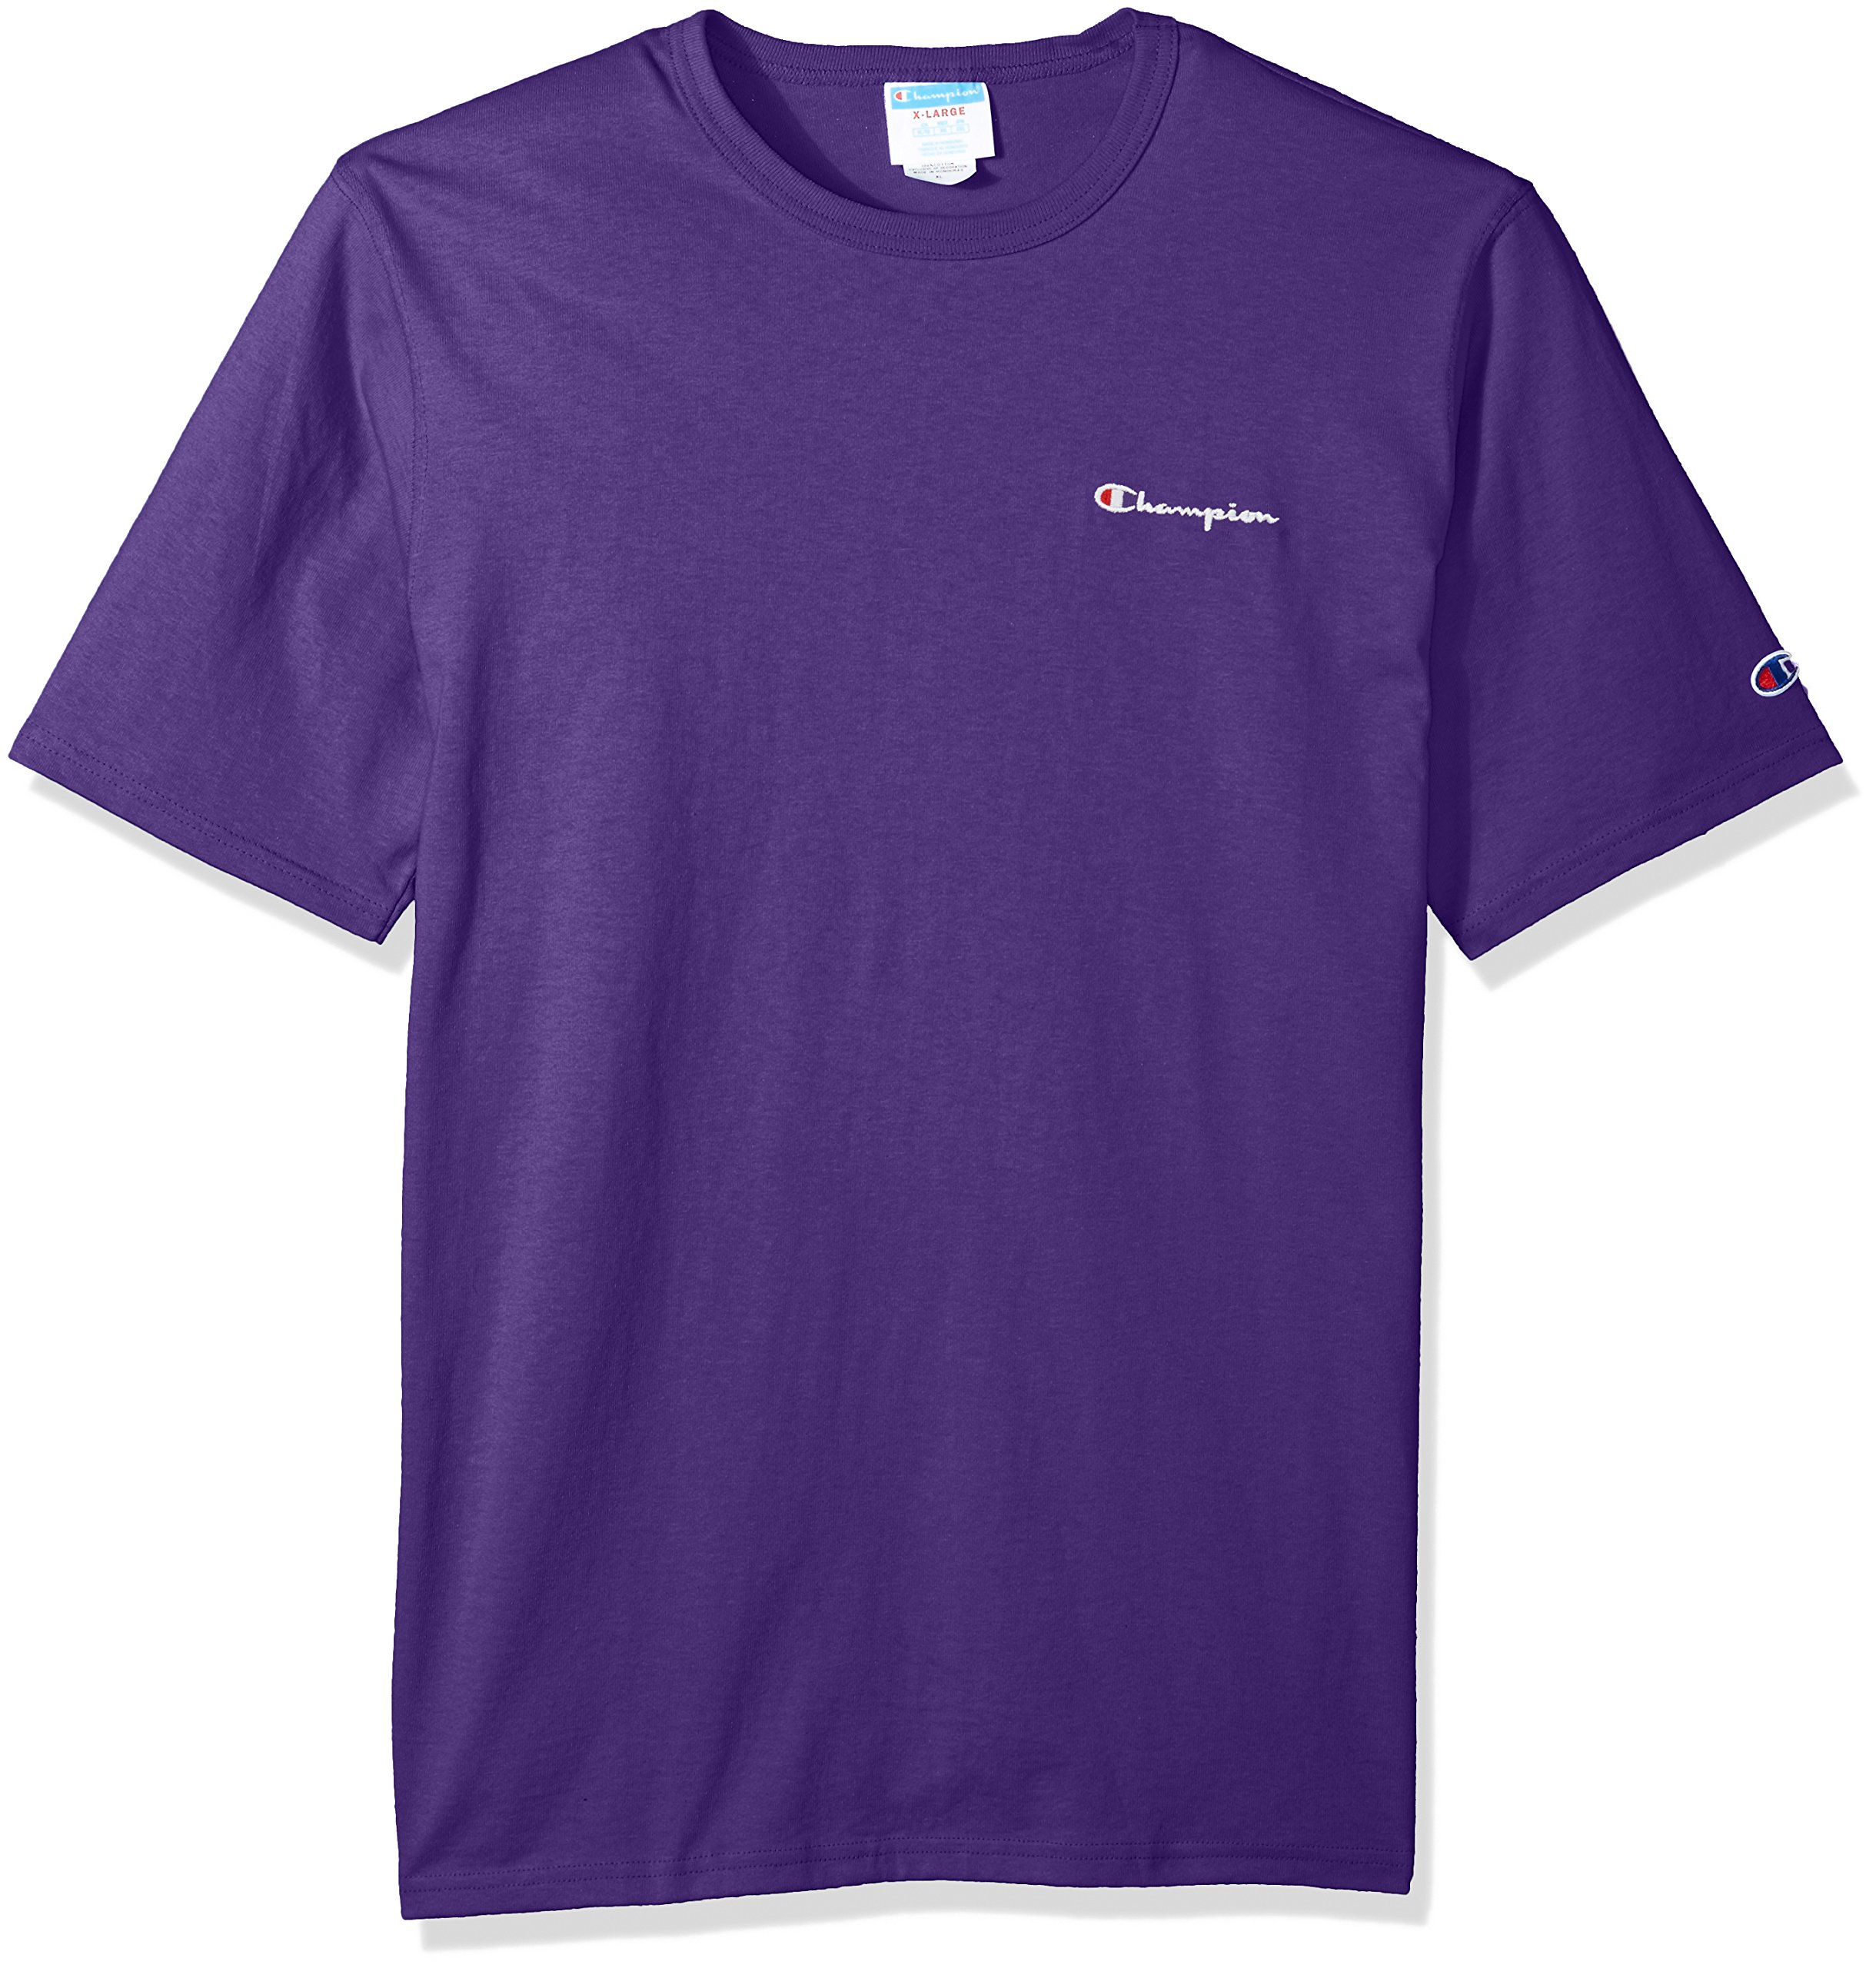 Champion LIFE Men's Heritage Tee, Purple Script Embroidery, XL